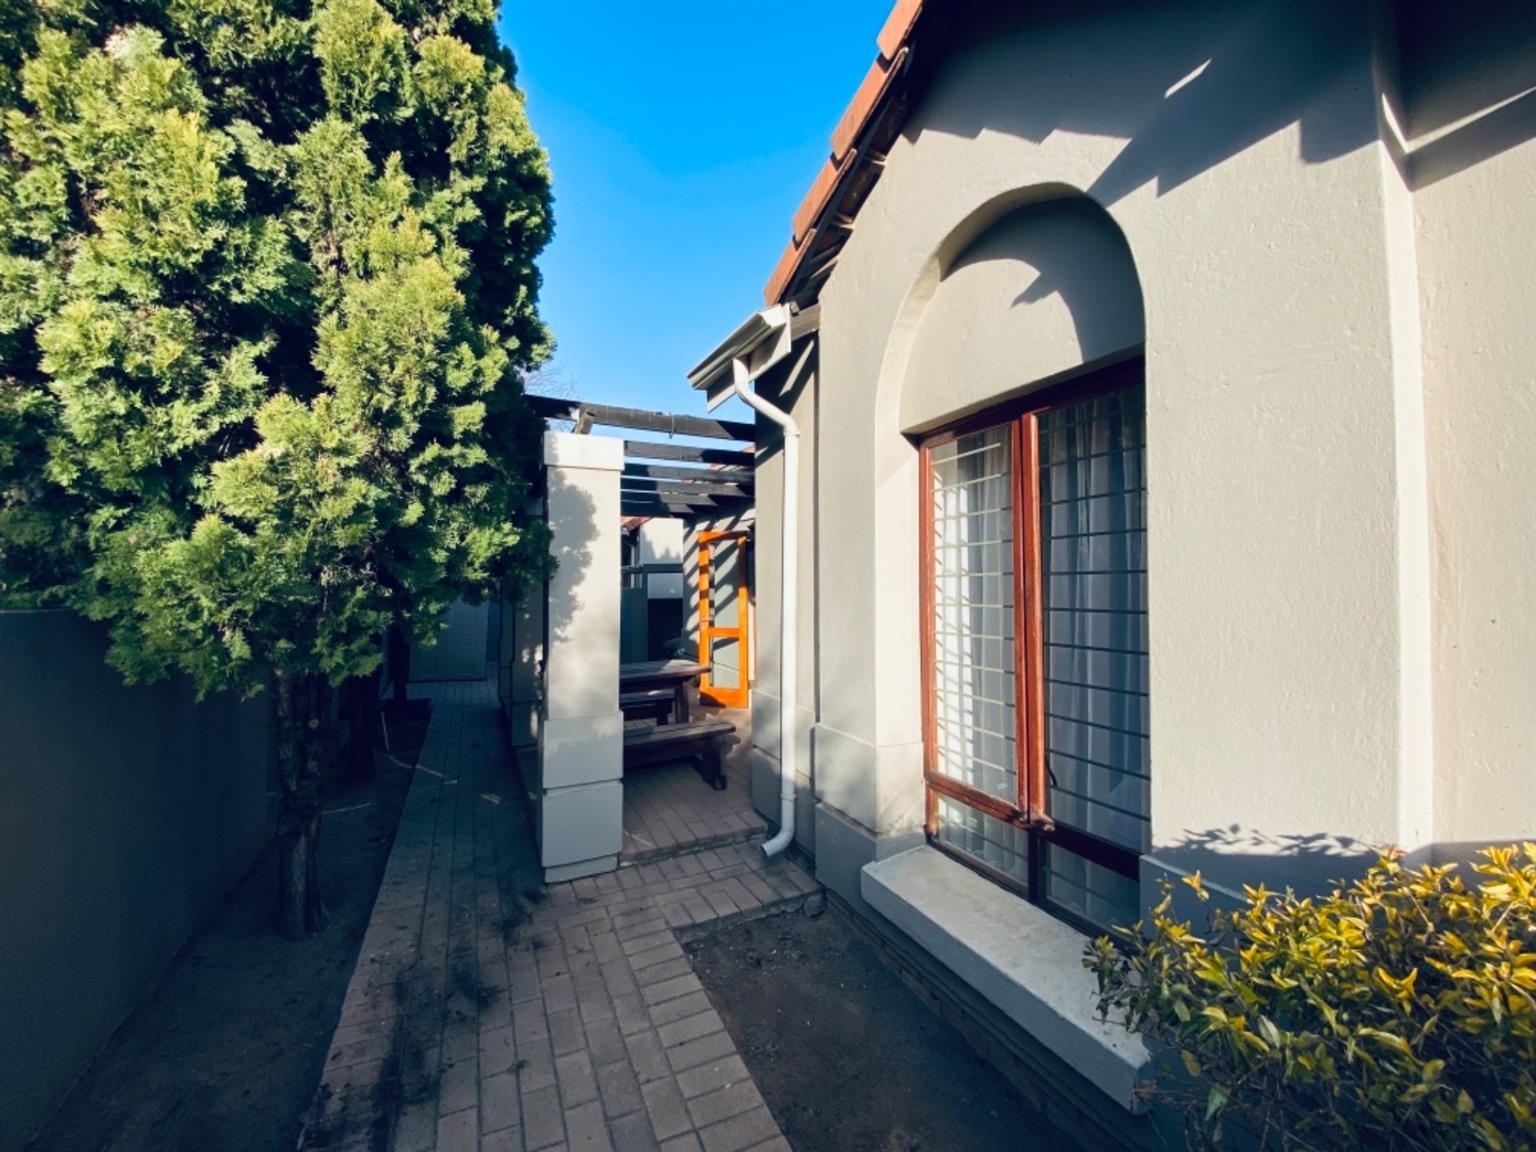 Townhouse For Sale in Maroeladal